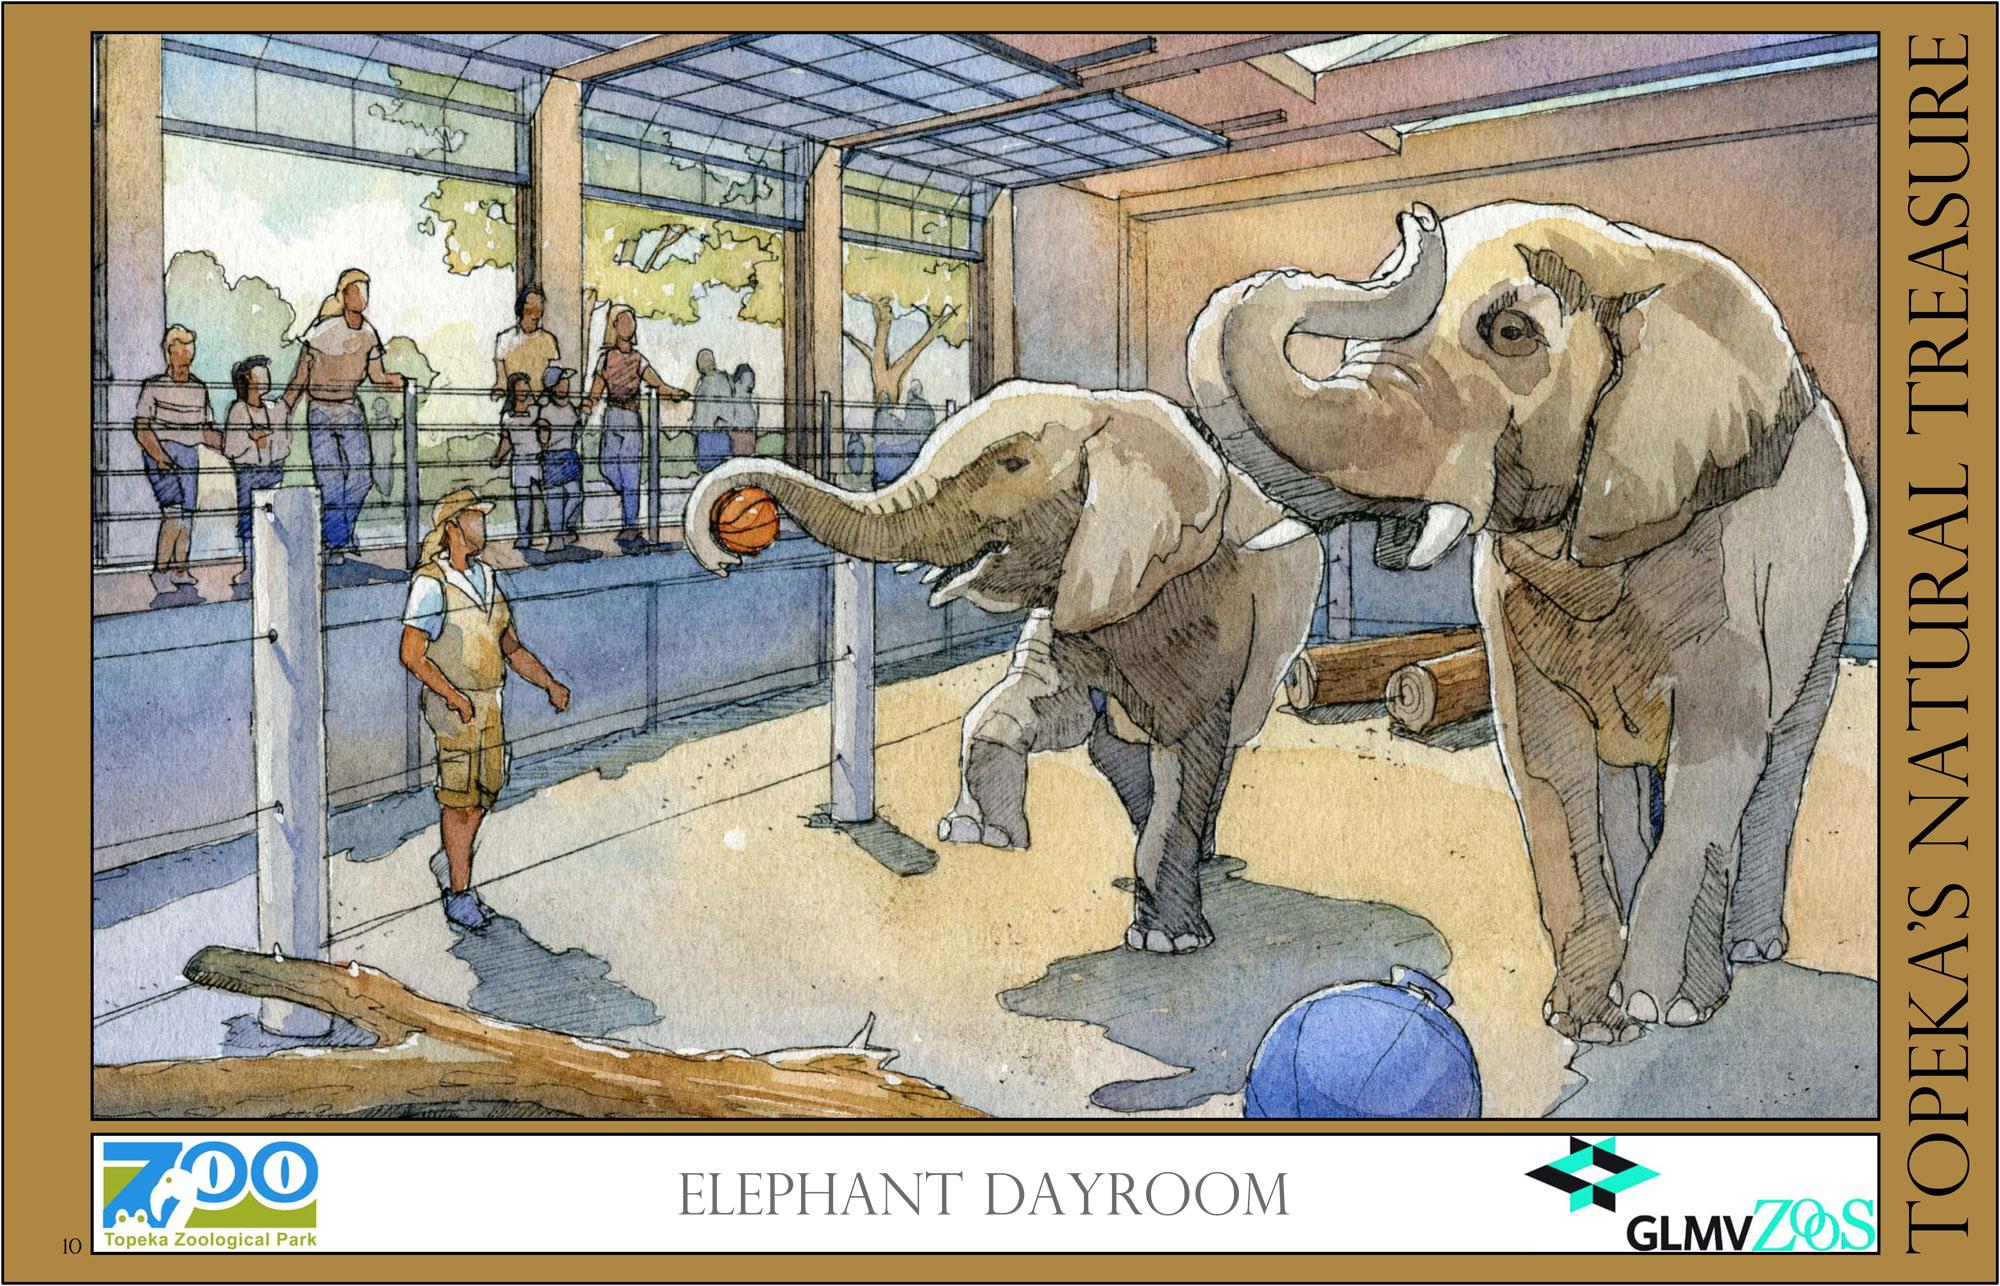 Elephant Dayroom